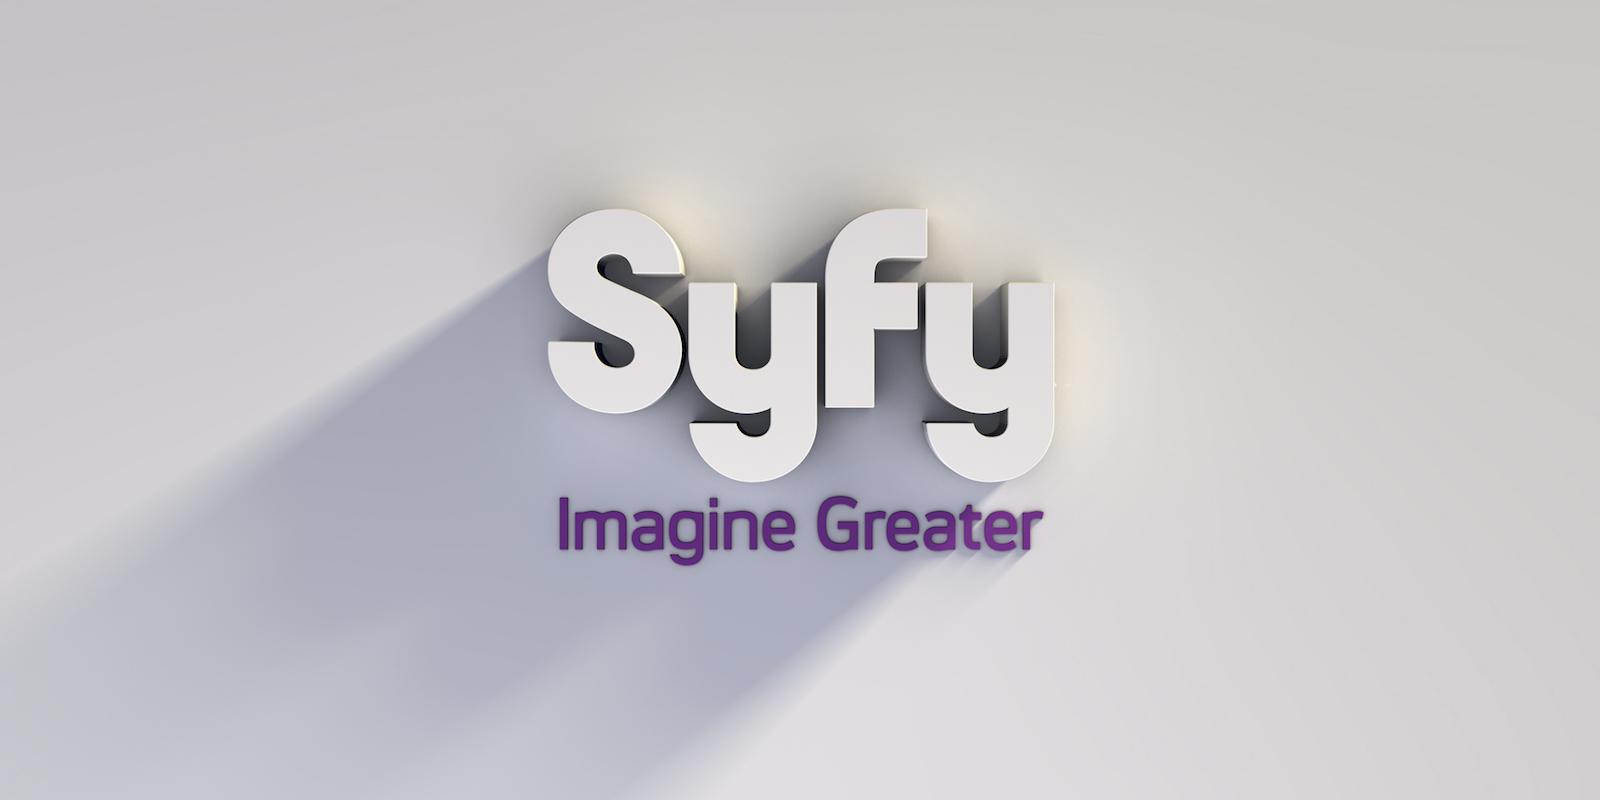 stranger in a strange land tv series in development at syfy